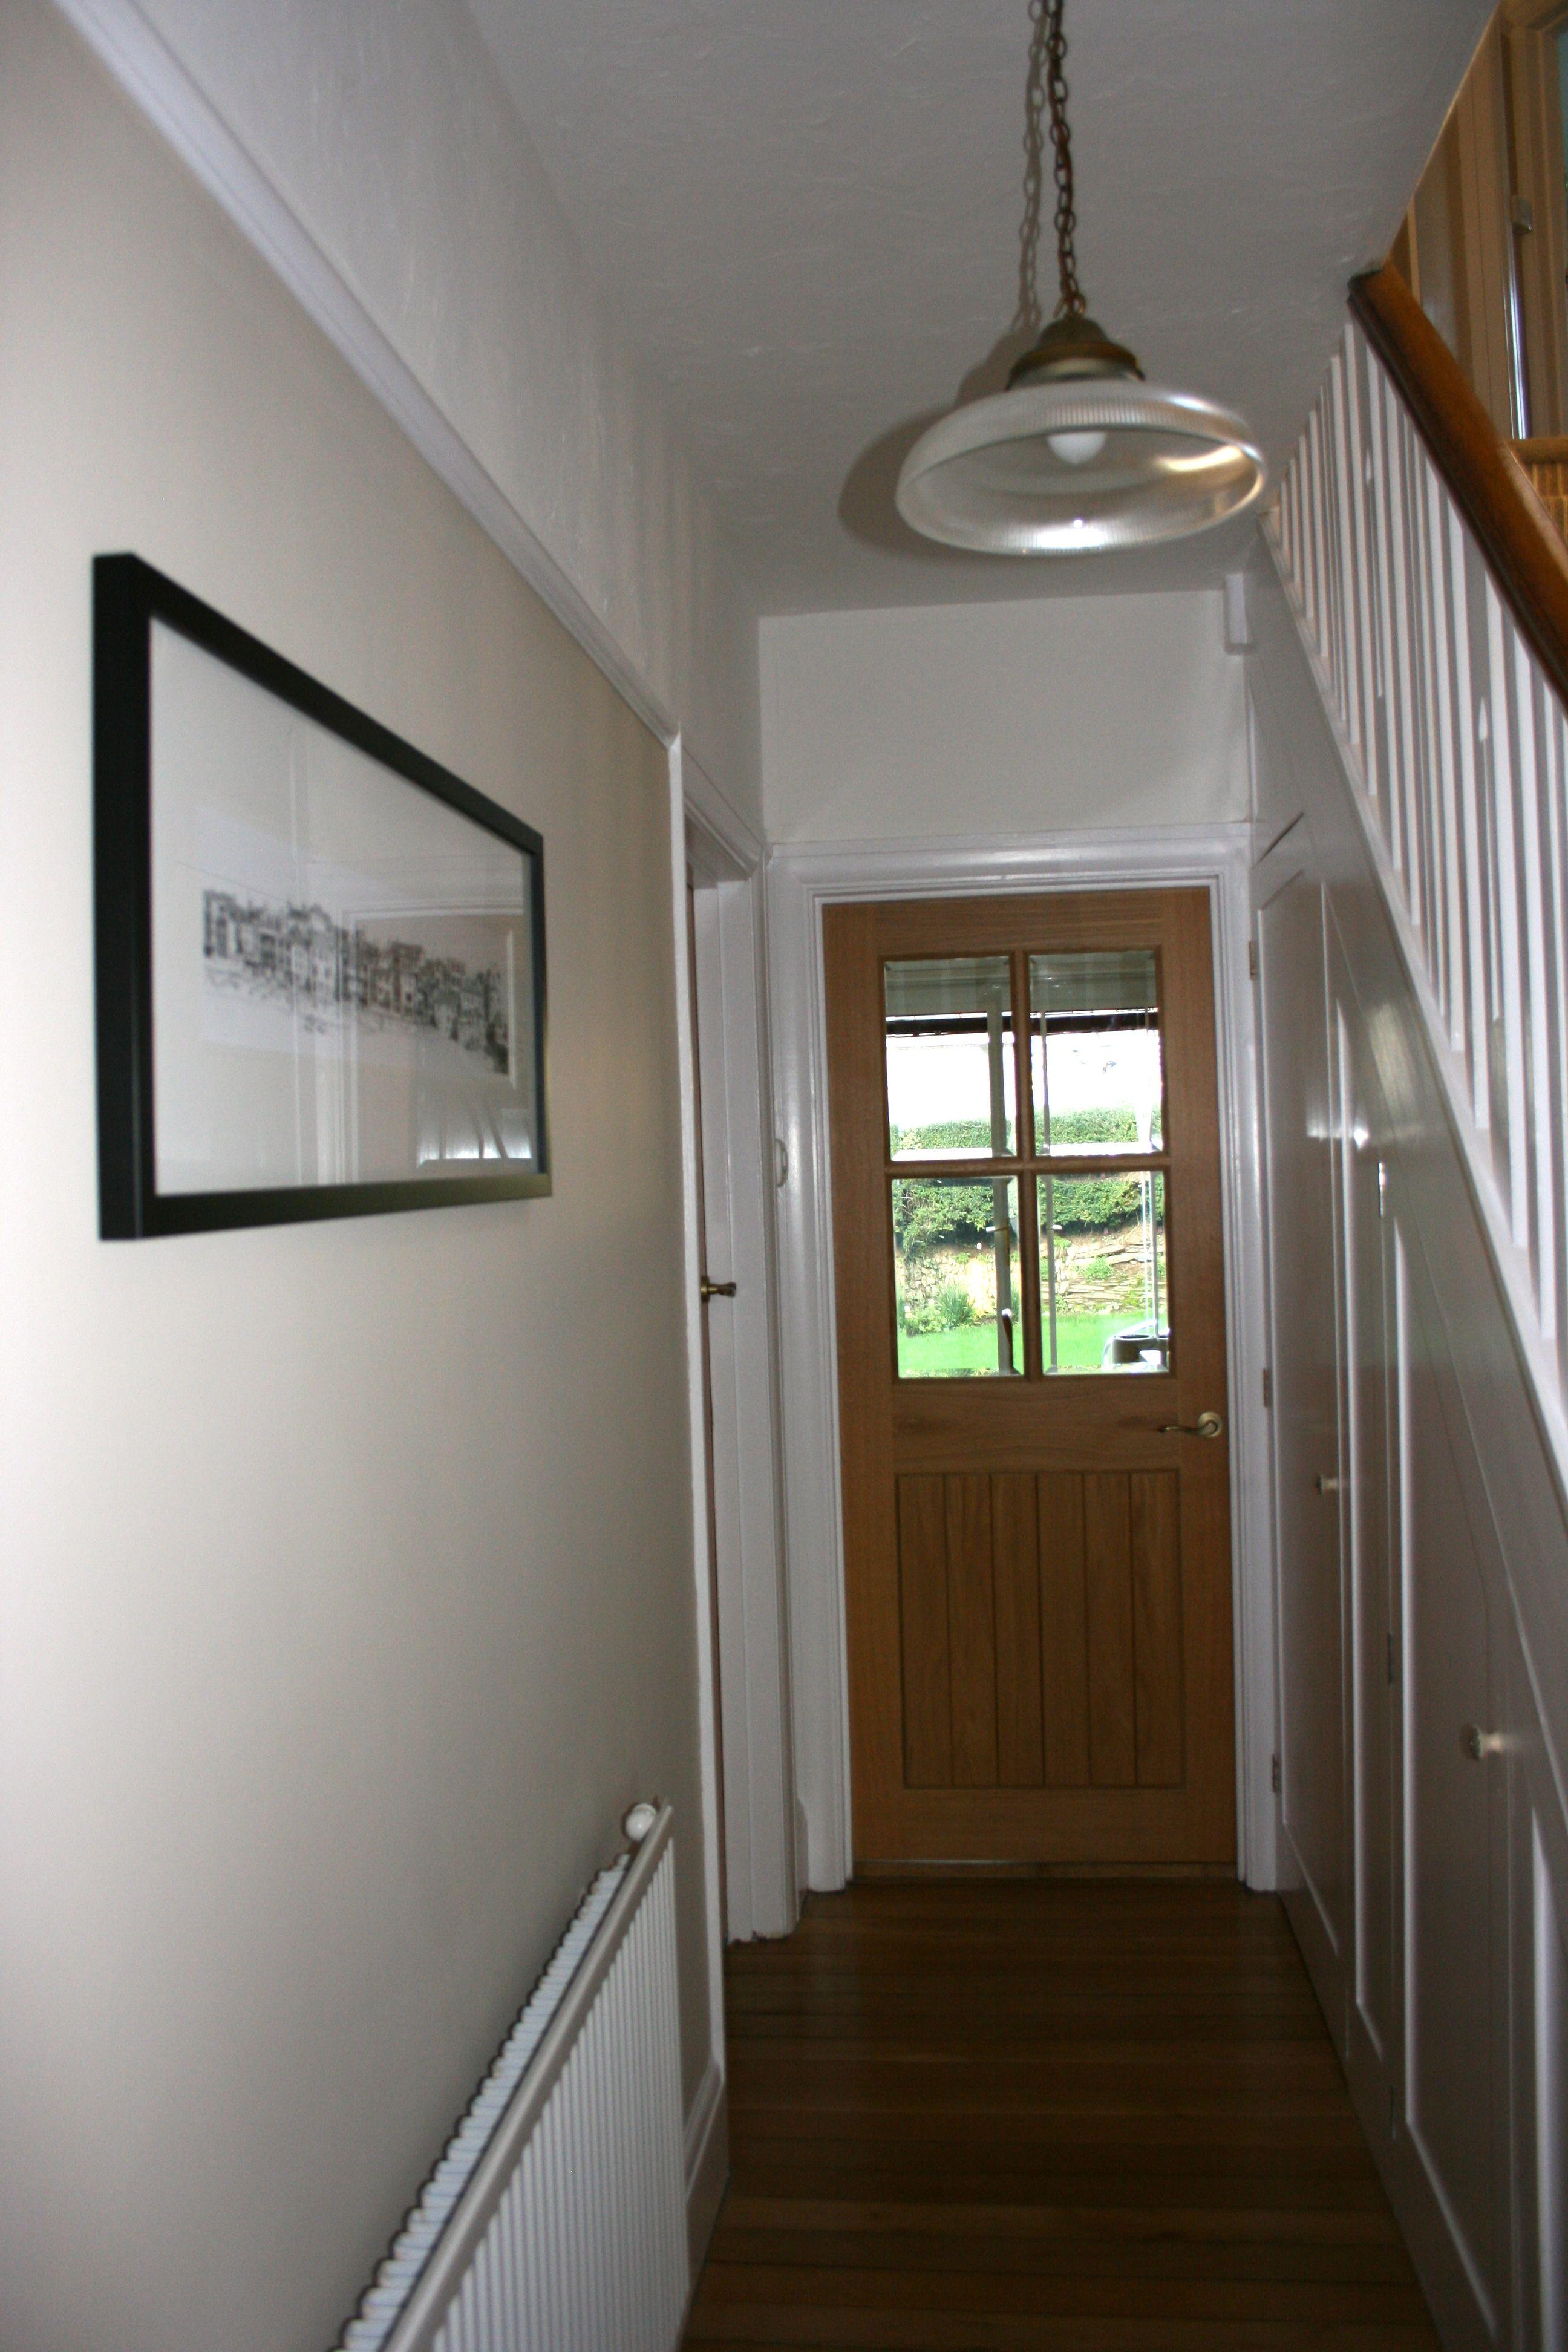 walls farrow and ball u0027oxford stone u0027 light by jim lawrence